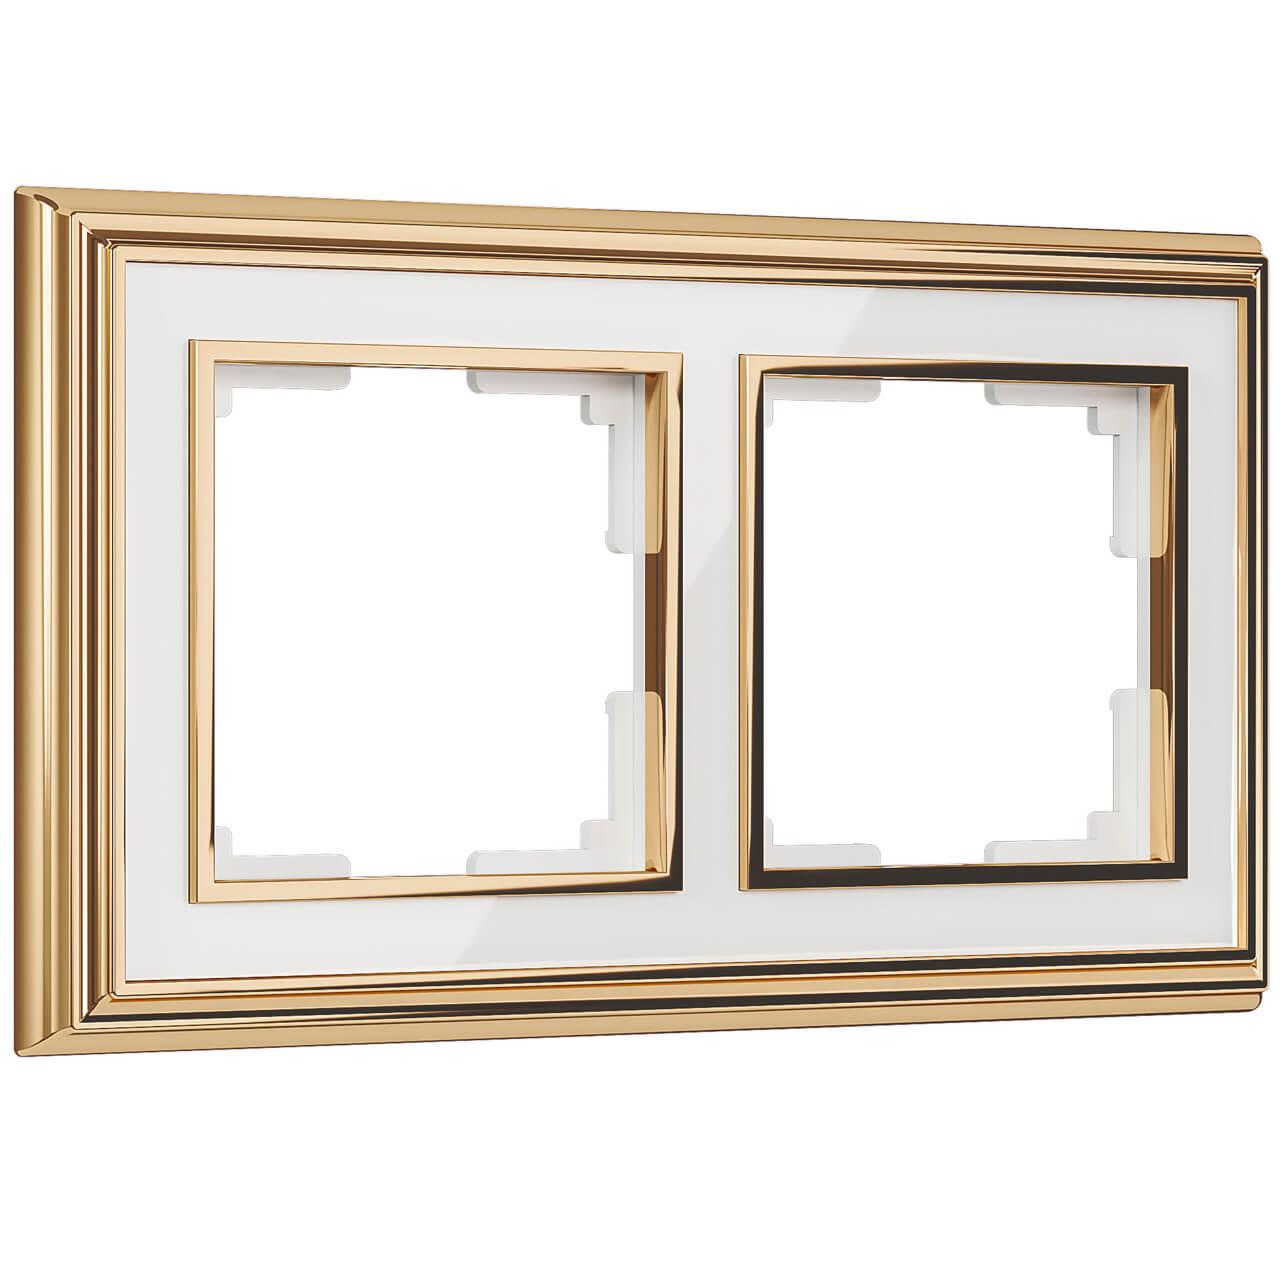 Рамка Werkel 4690389159152 Palacio золото/белый